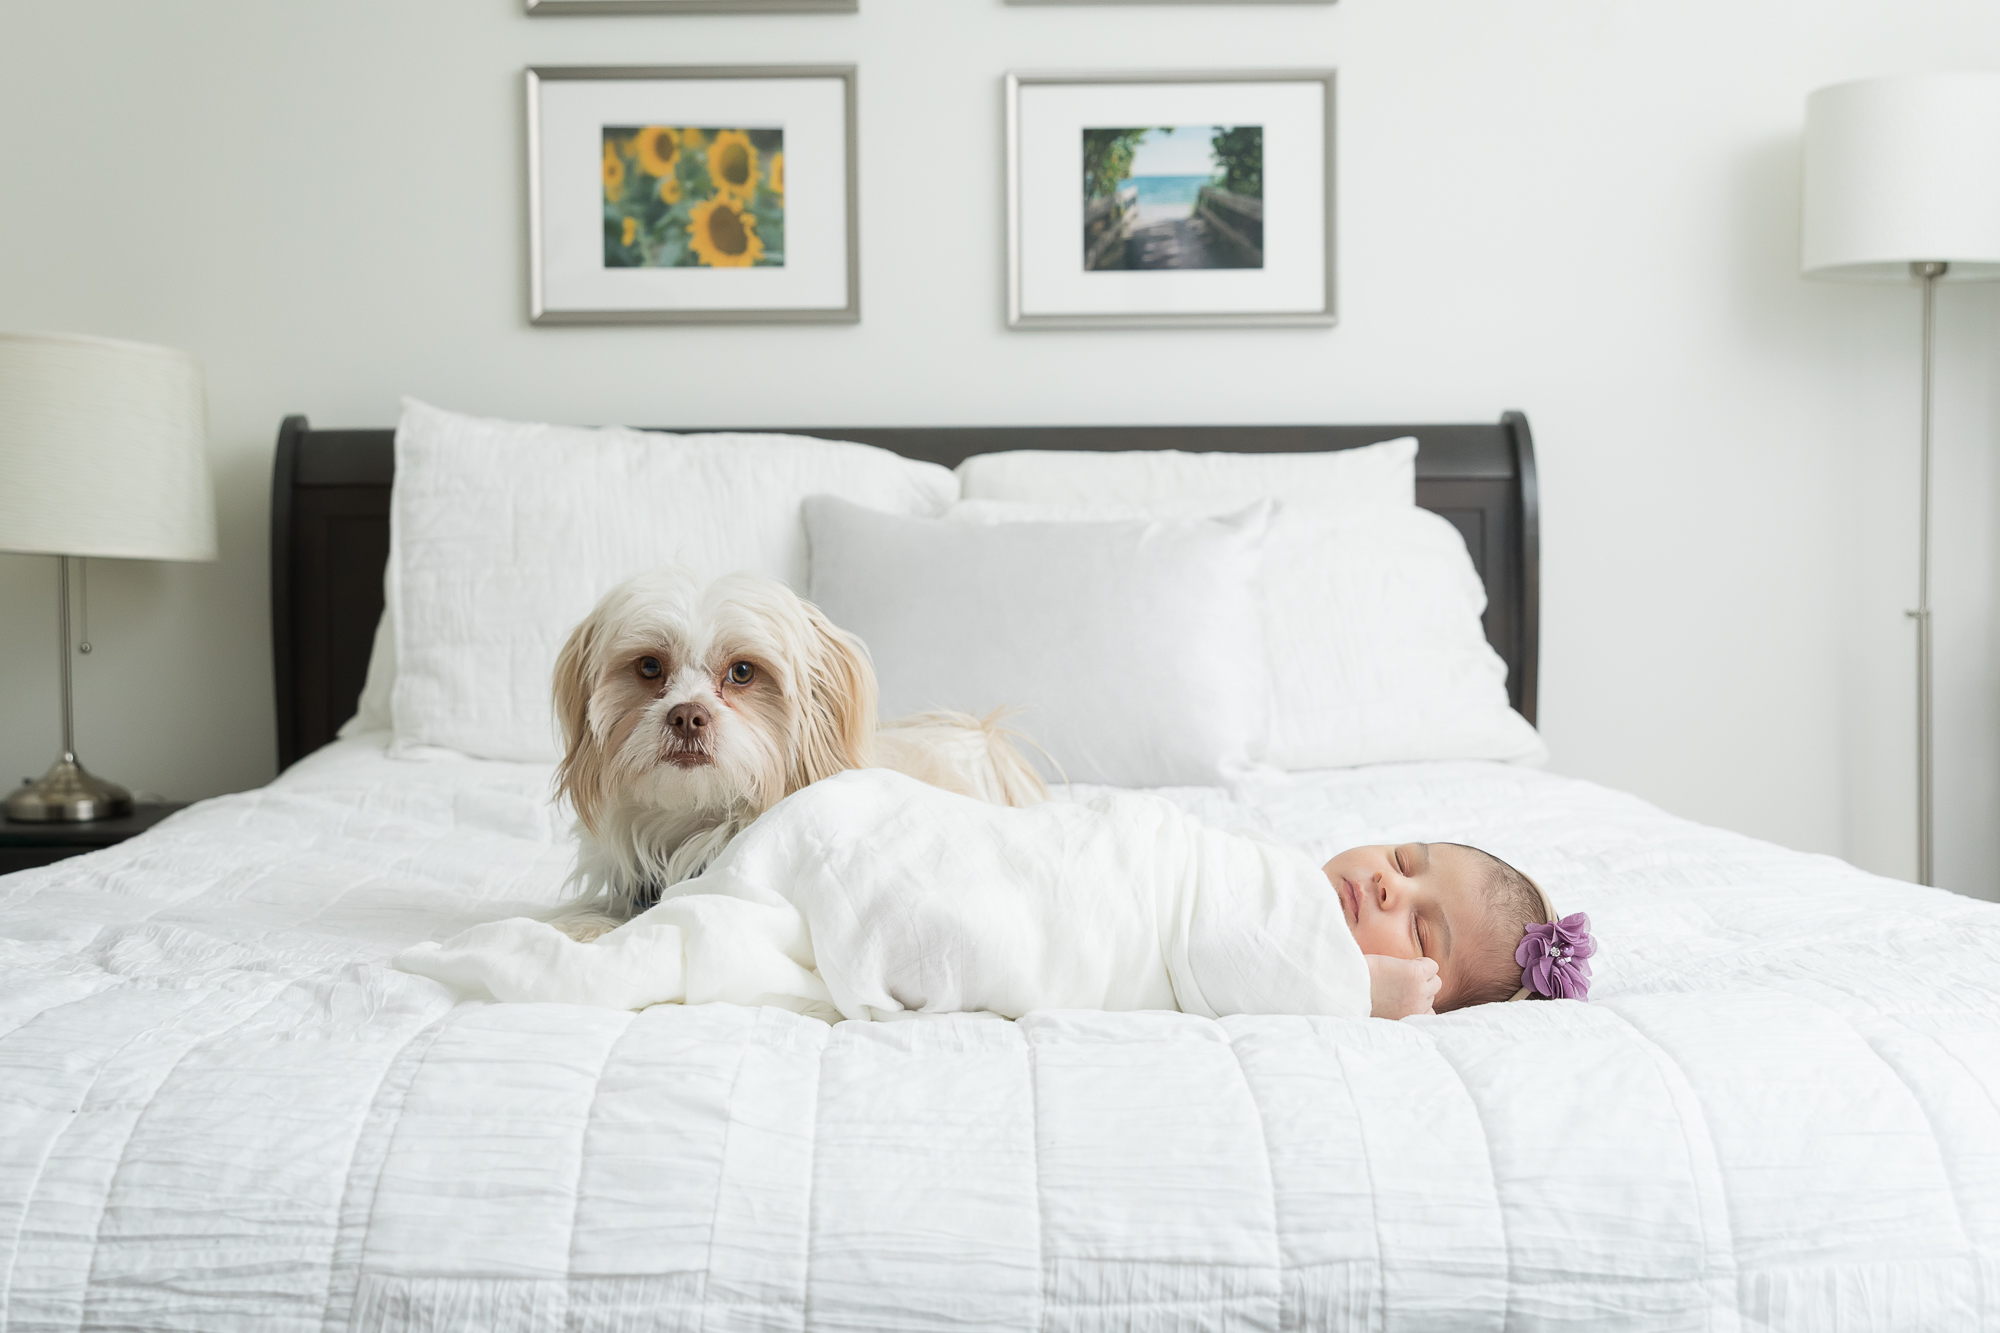 Ann Arbor Baby Photos | Three Generations & a Pup